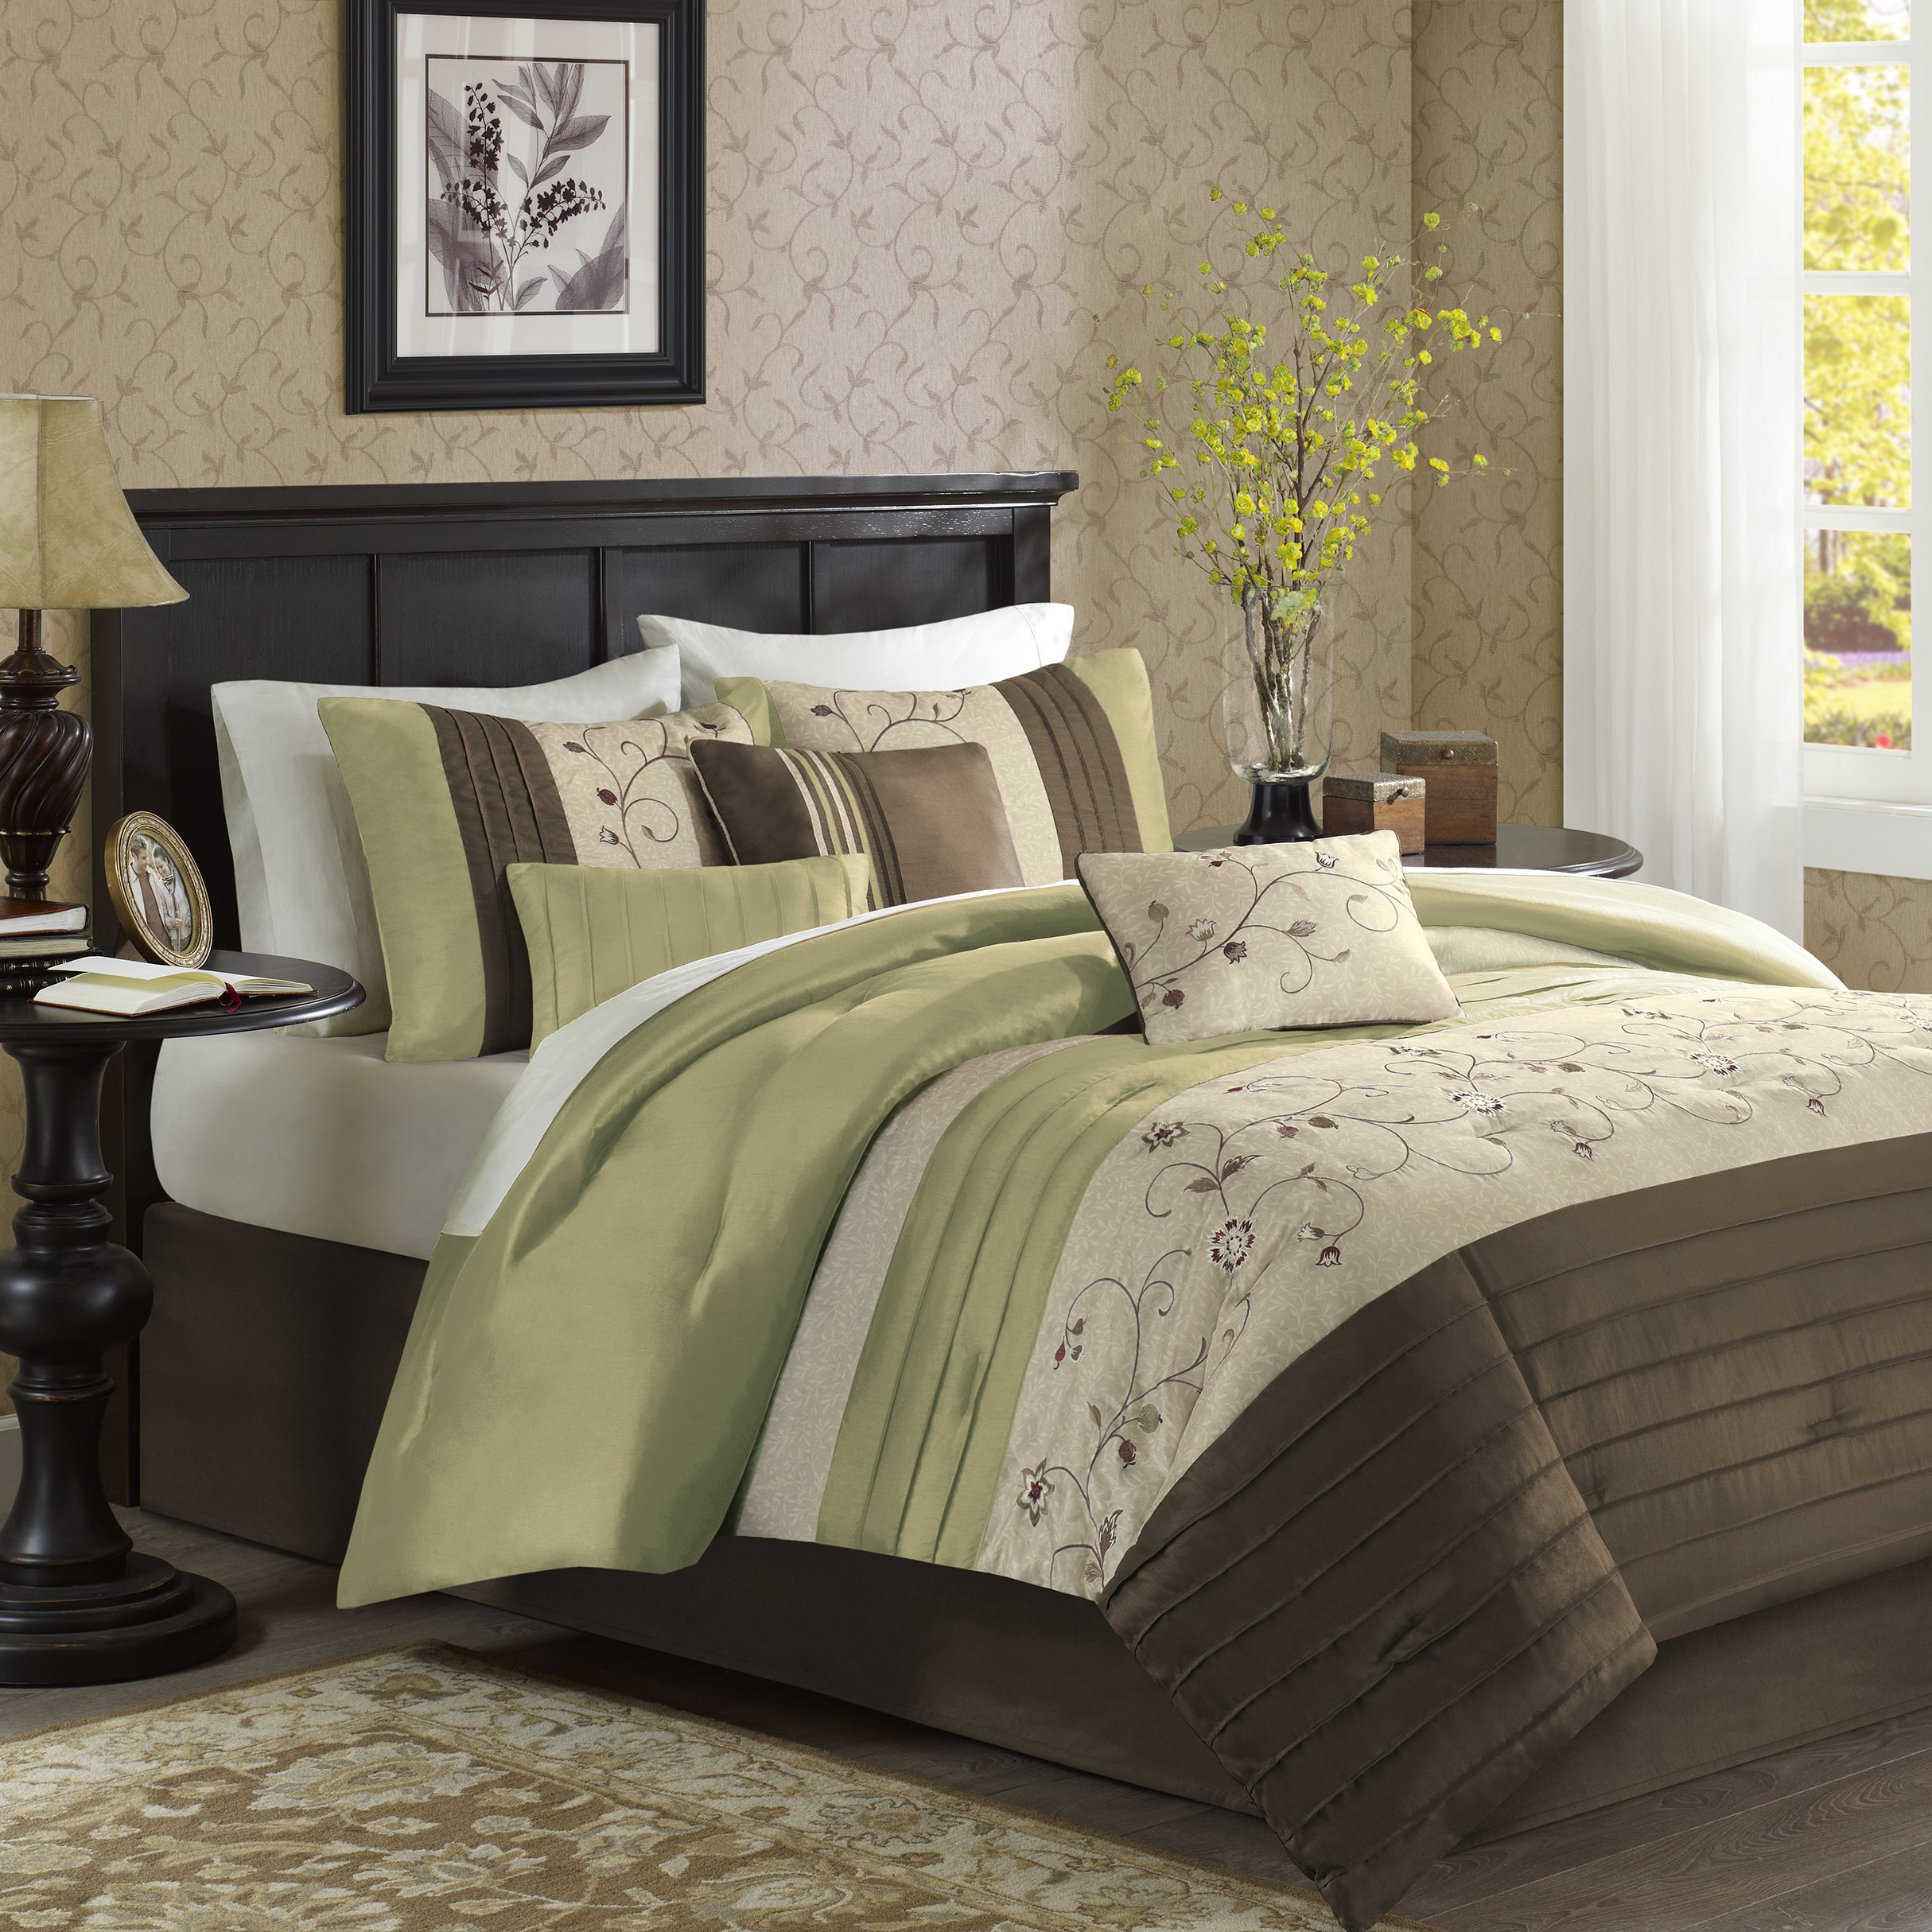 Madison Park Serene 7 Piece Comforter Set, California King, Green